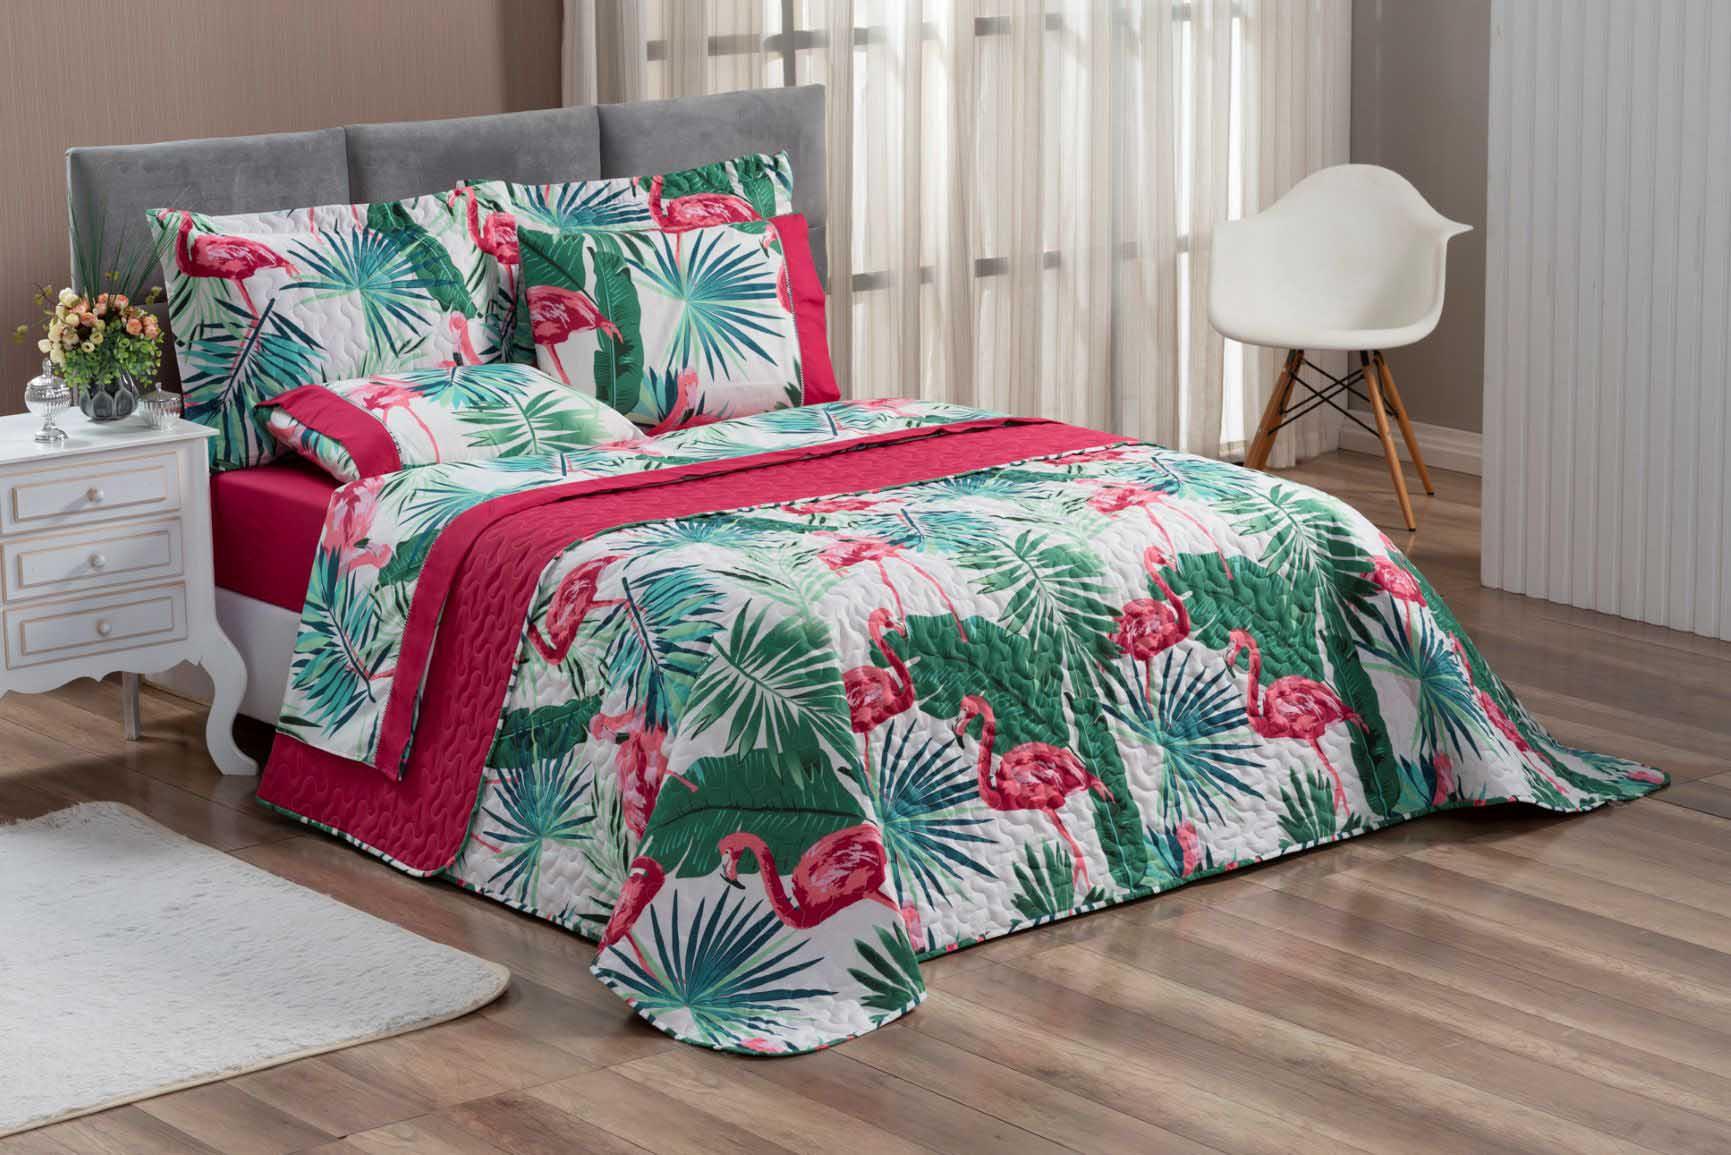 Kit Cobre Leito Colcha Queen 100% Costurada Dupla Face 3 Peças Naturale Flamingo Rosa